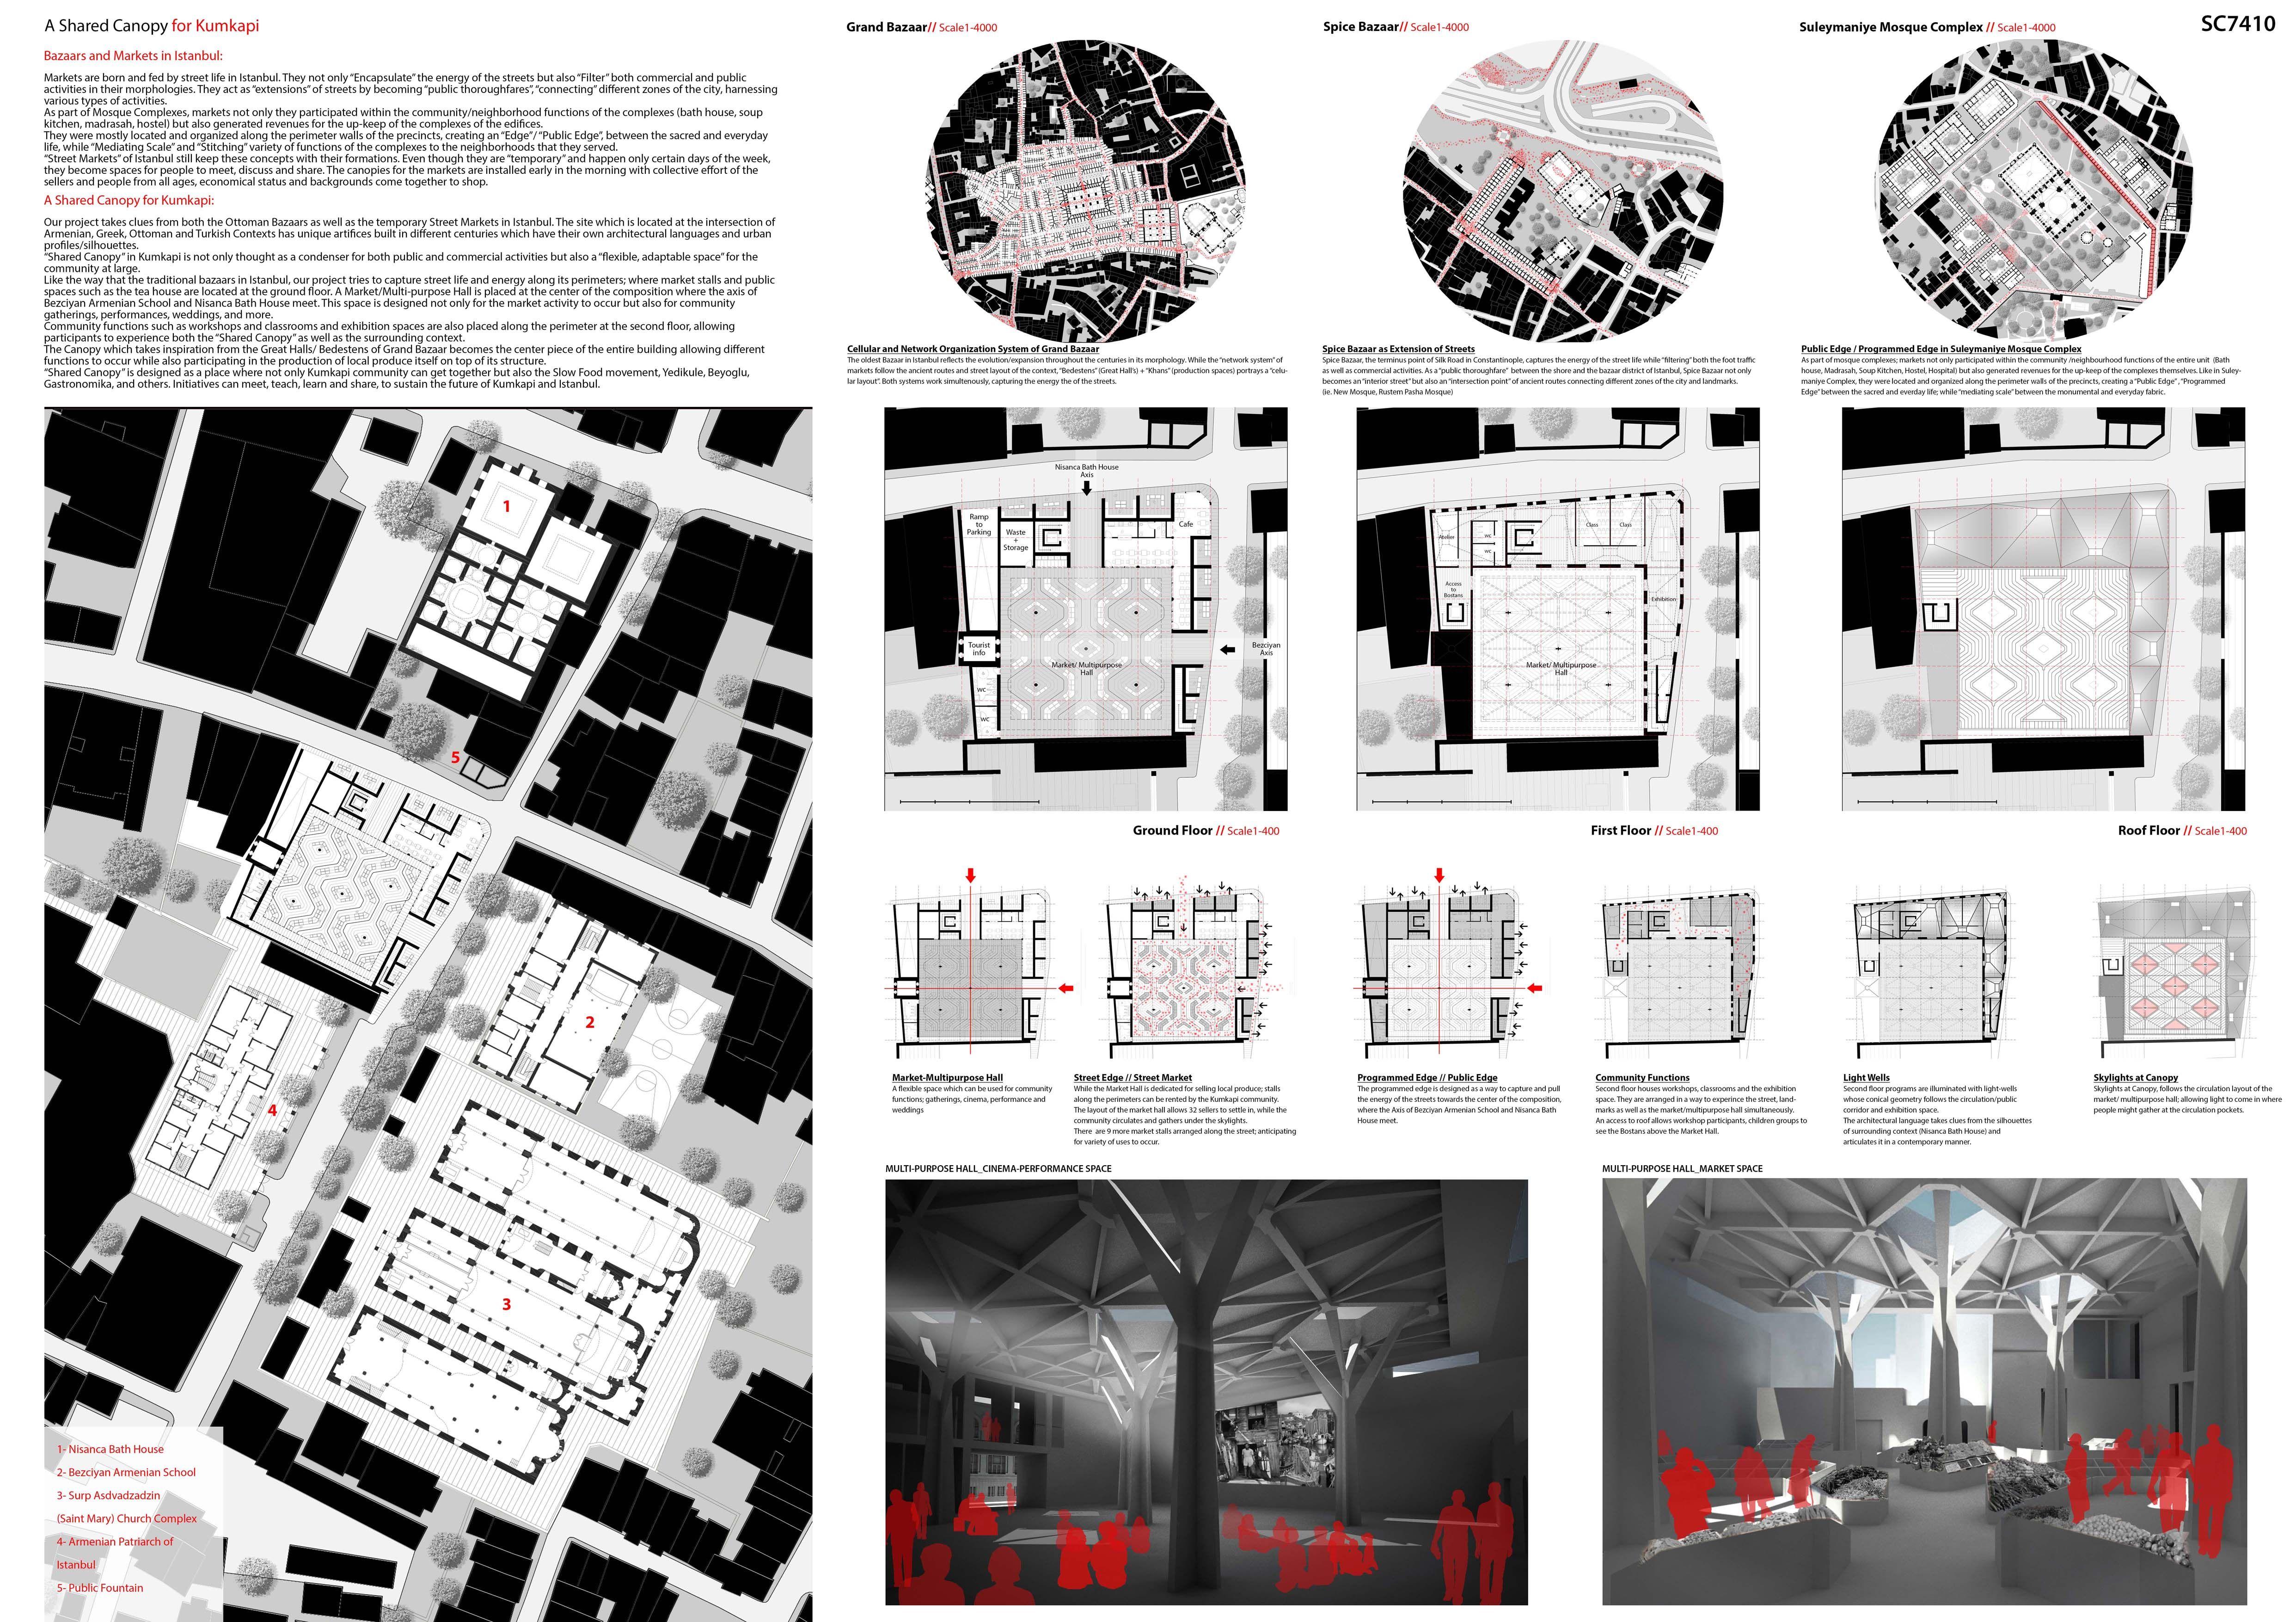 Interieur Design Studio Luis Bustamente: Closet